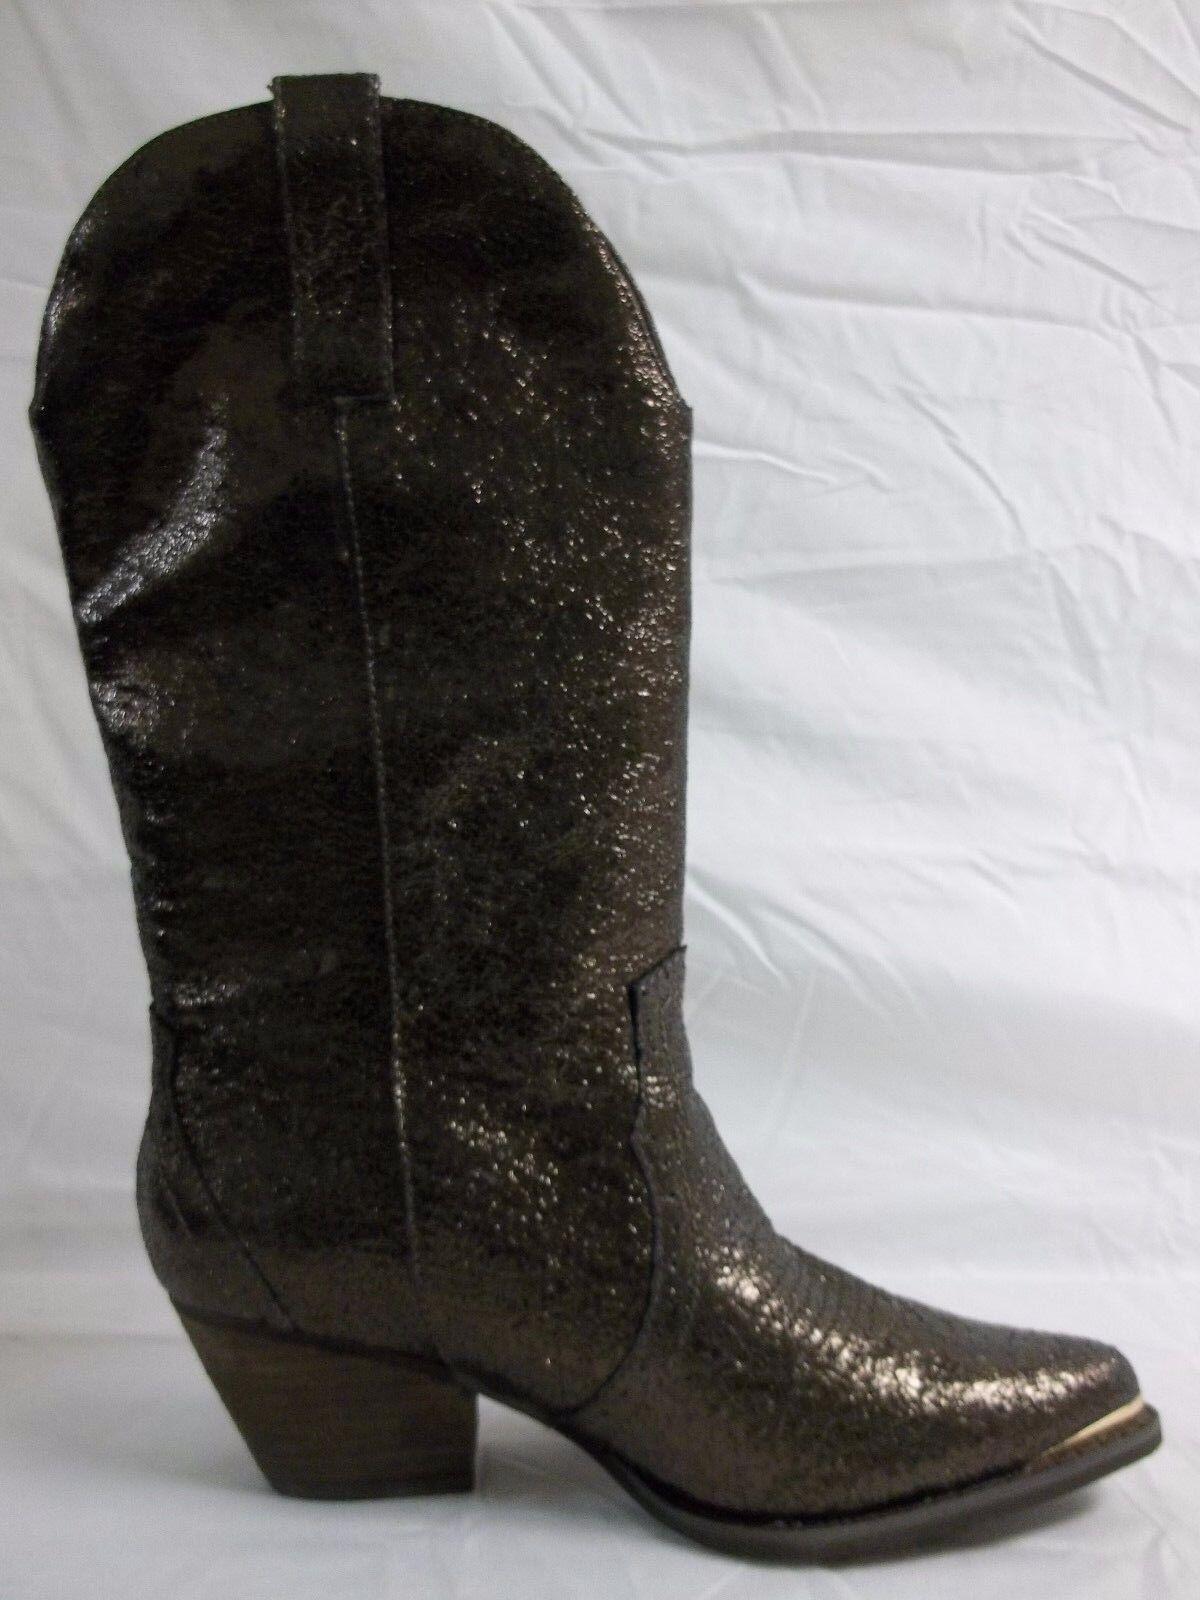 Reba Size 7.5 M Biker Brown Leather Mid Calf Cowboy Cowboy Cowboy Boots New Womens shoes NWOB 187f25